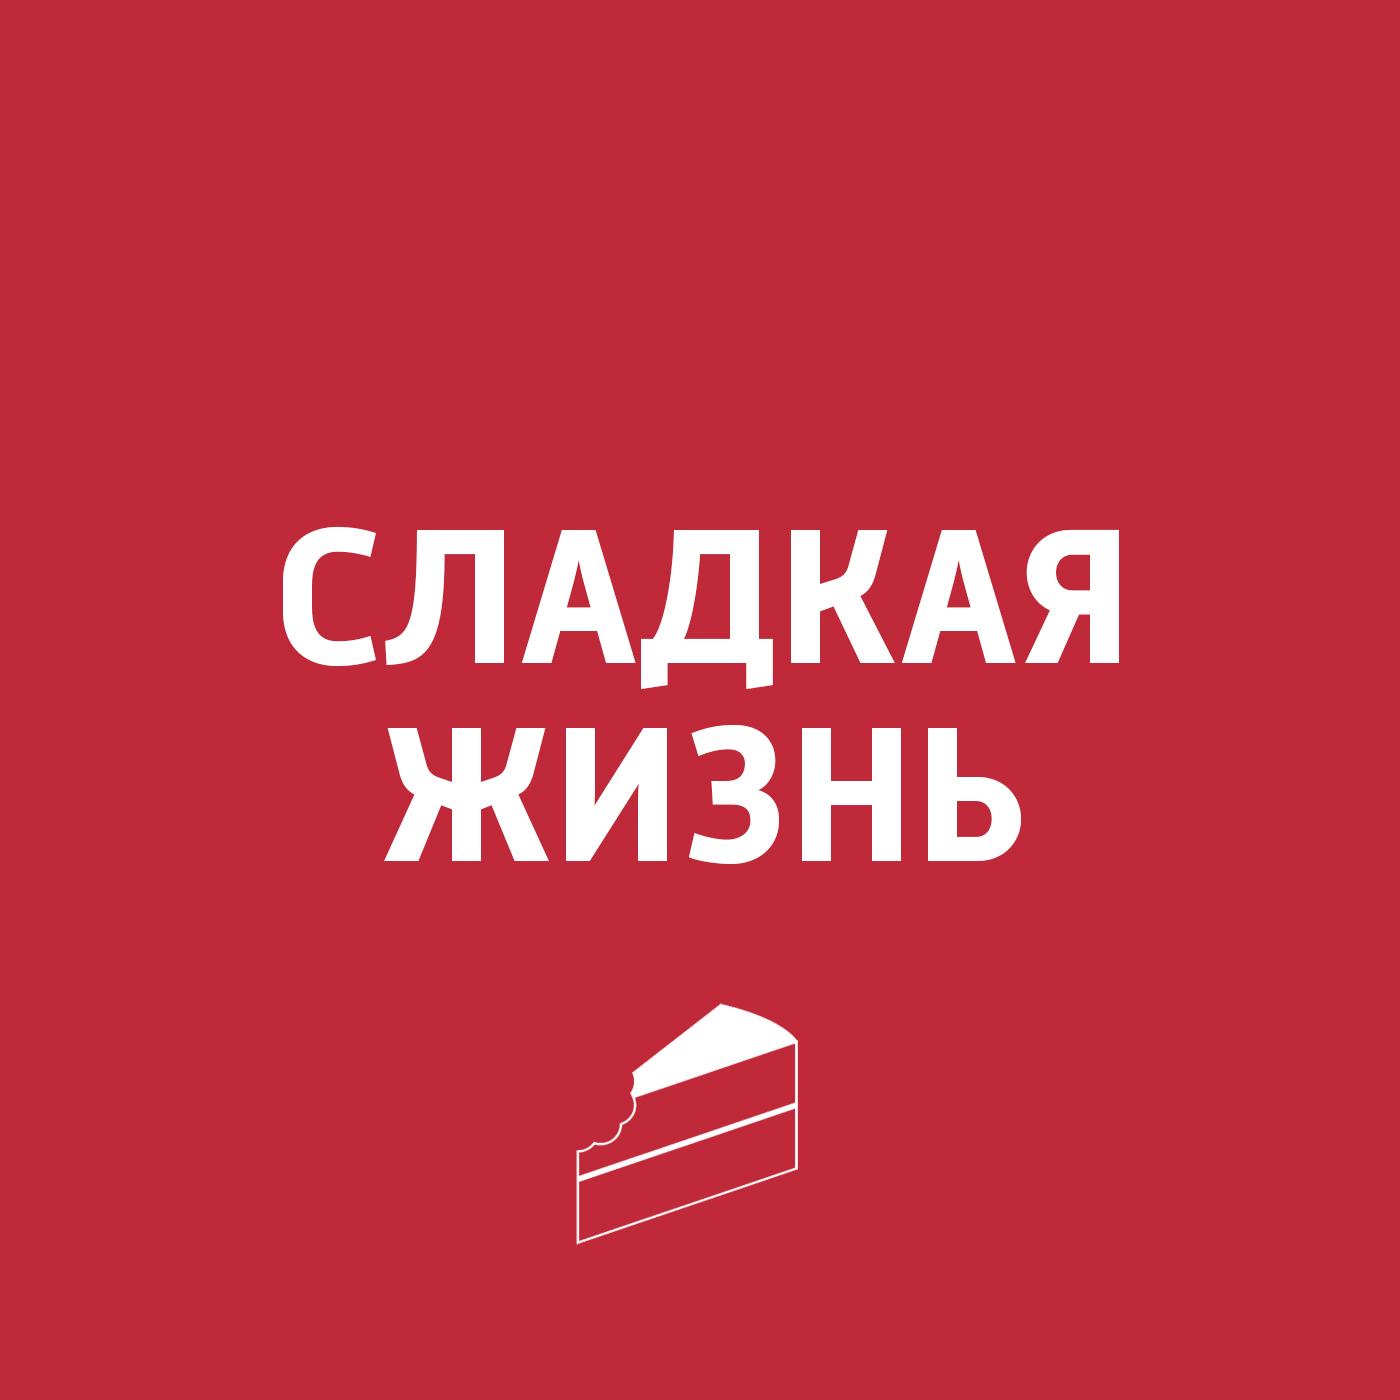 Картаев Павел Бискотти картаев павел киберспорт в россии приравняли к футболу